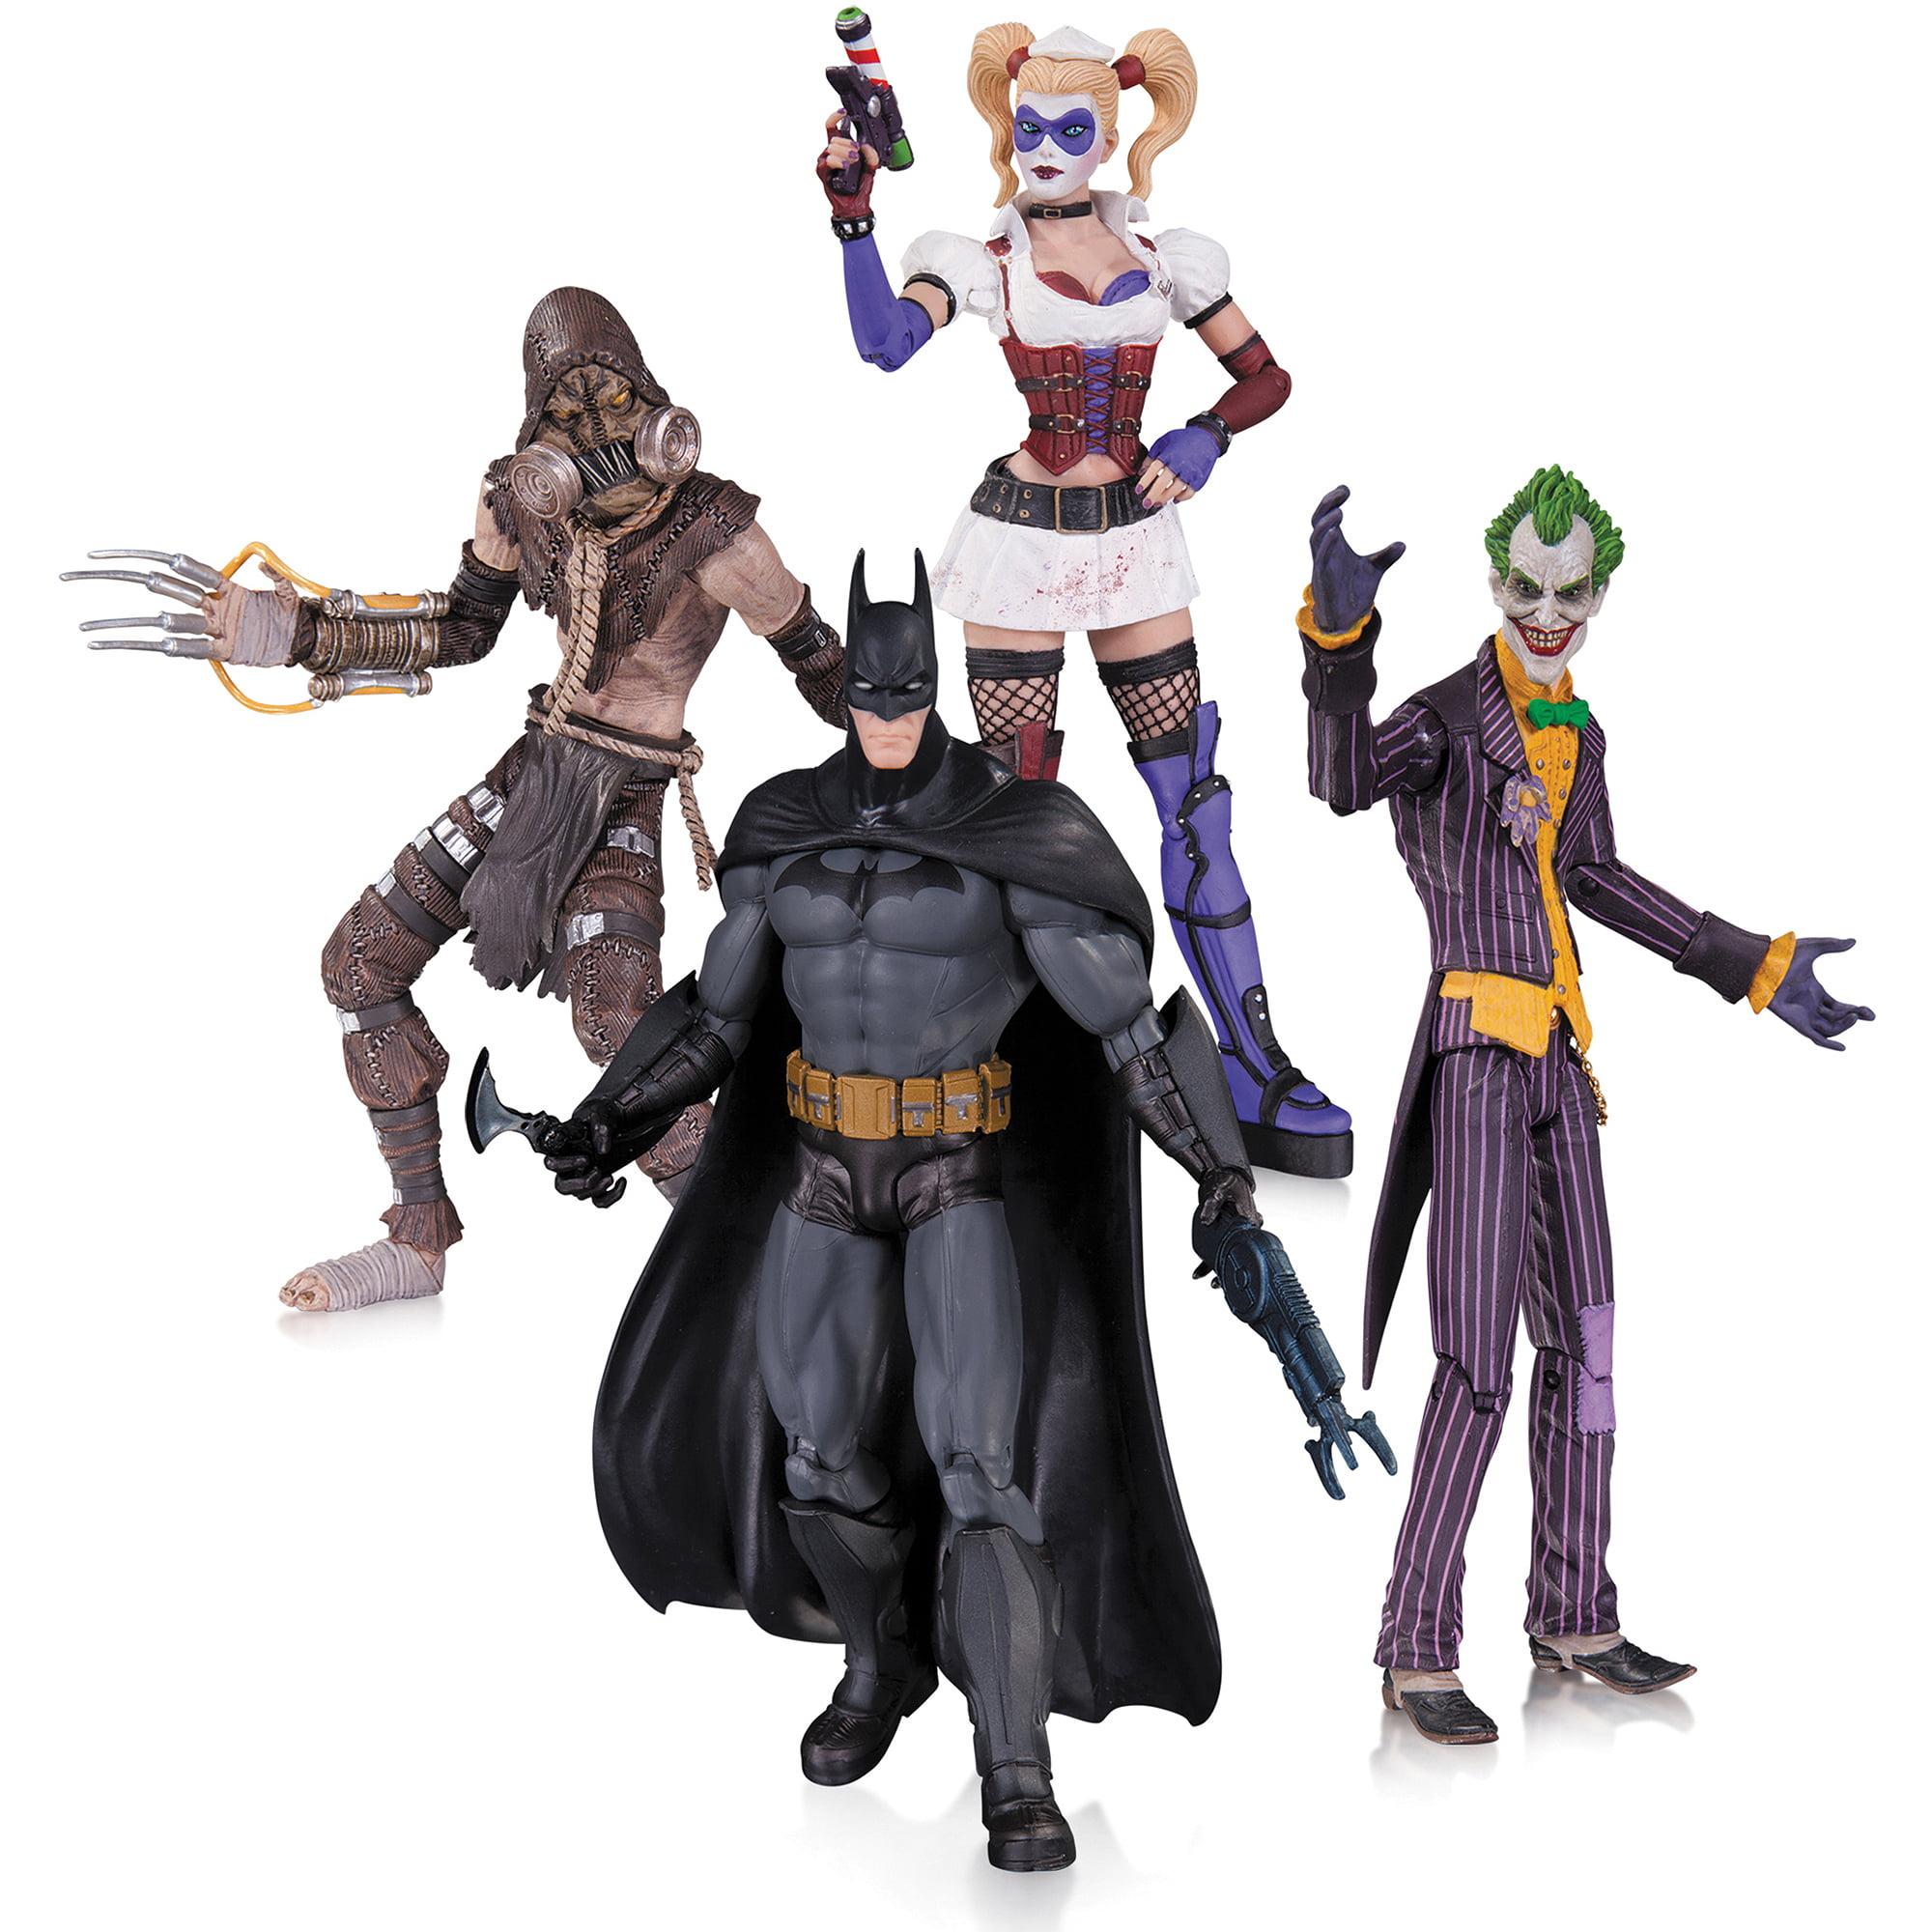 DC Comics Arkham Asylum 4-Pack Action Figure Set, Joker, Harley Quinn, Batman and... by Generic